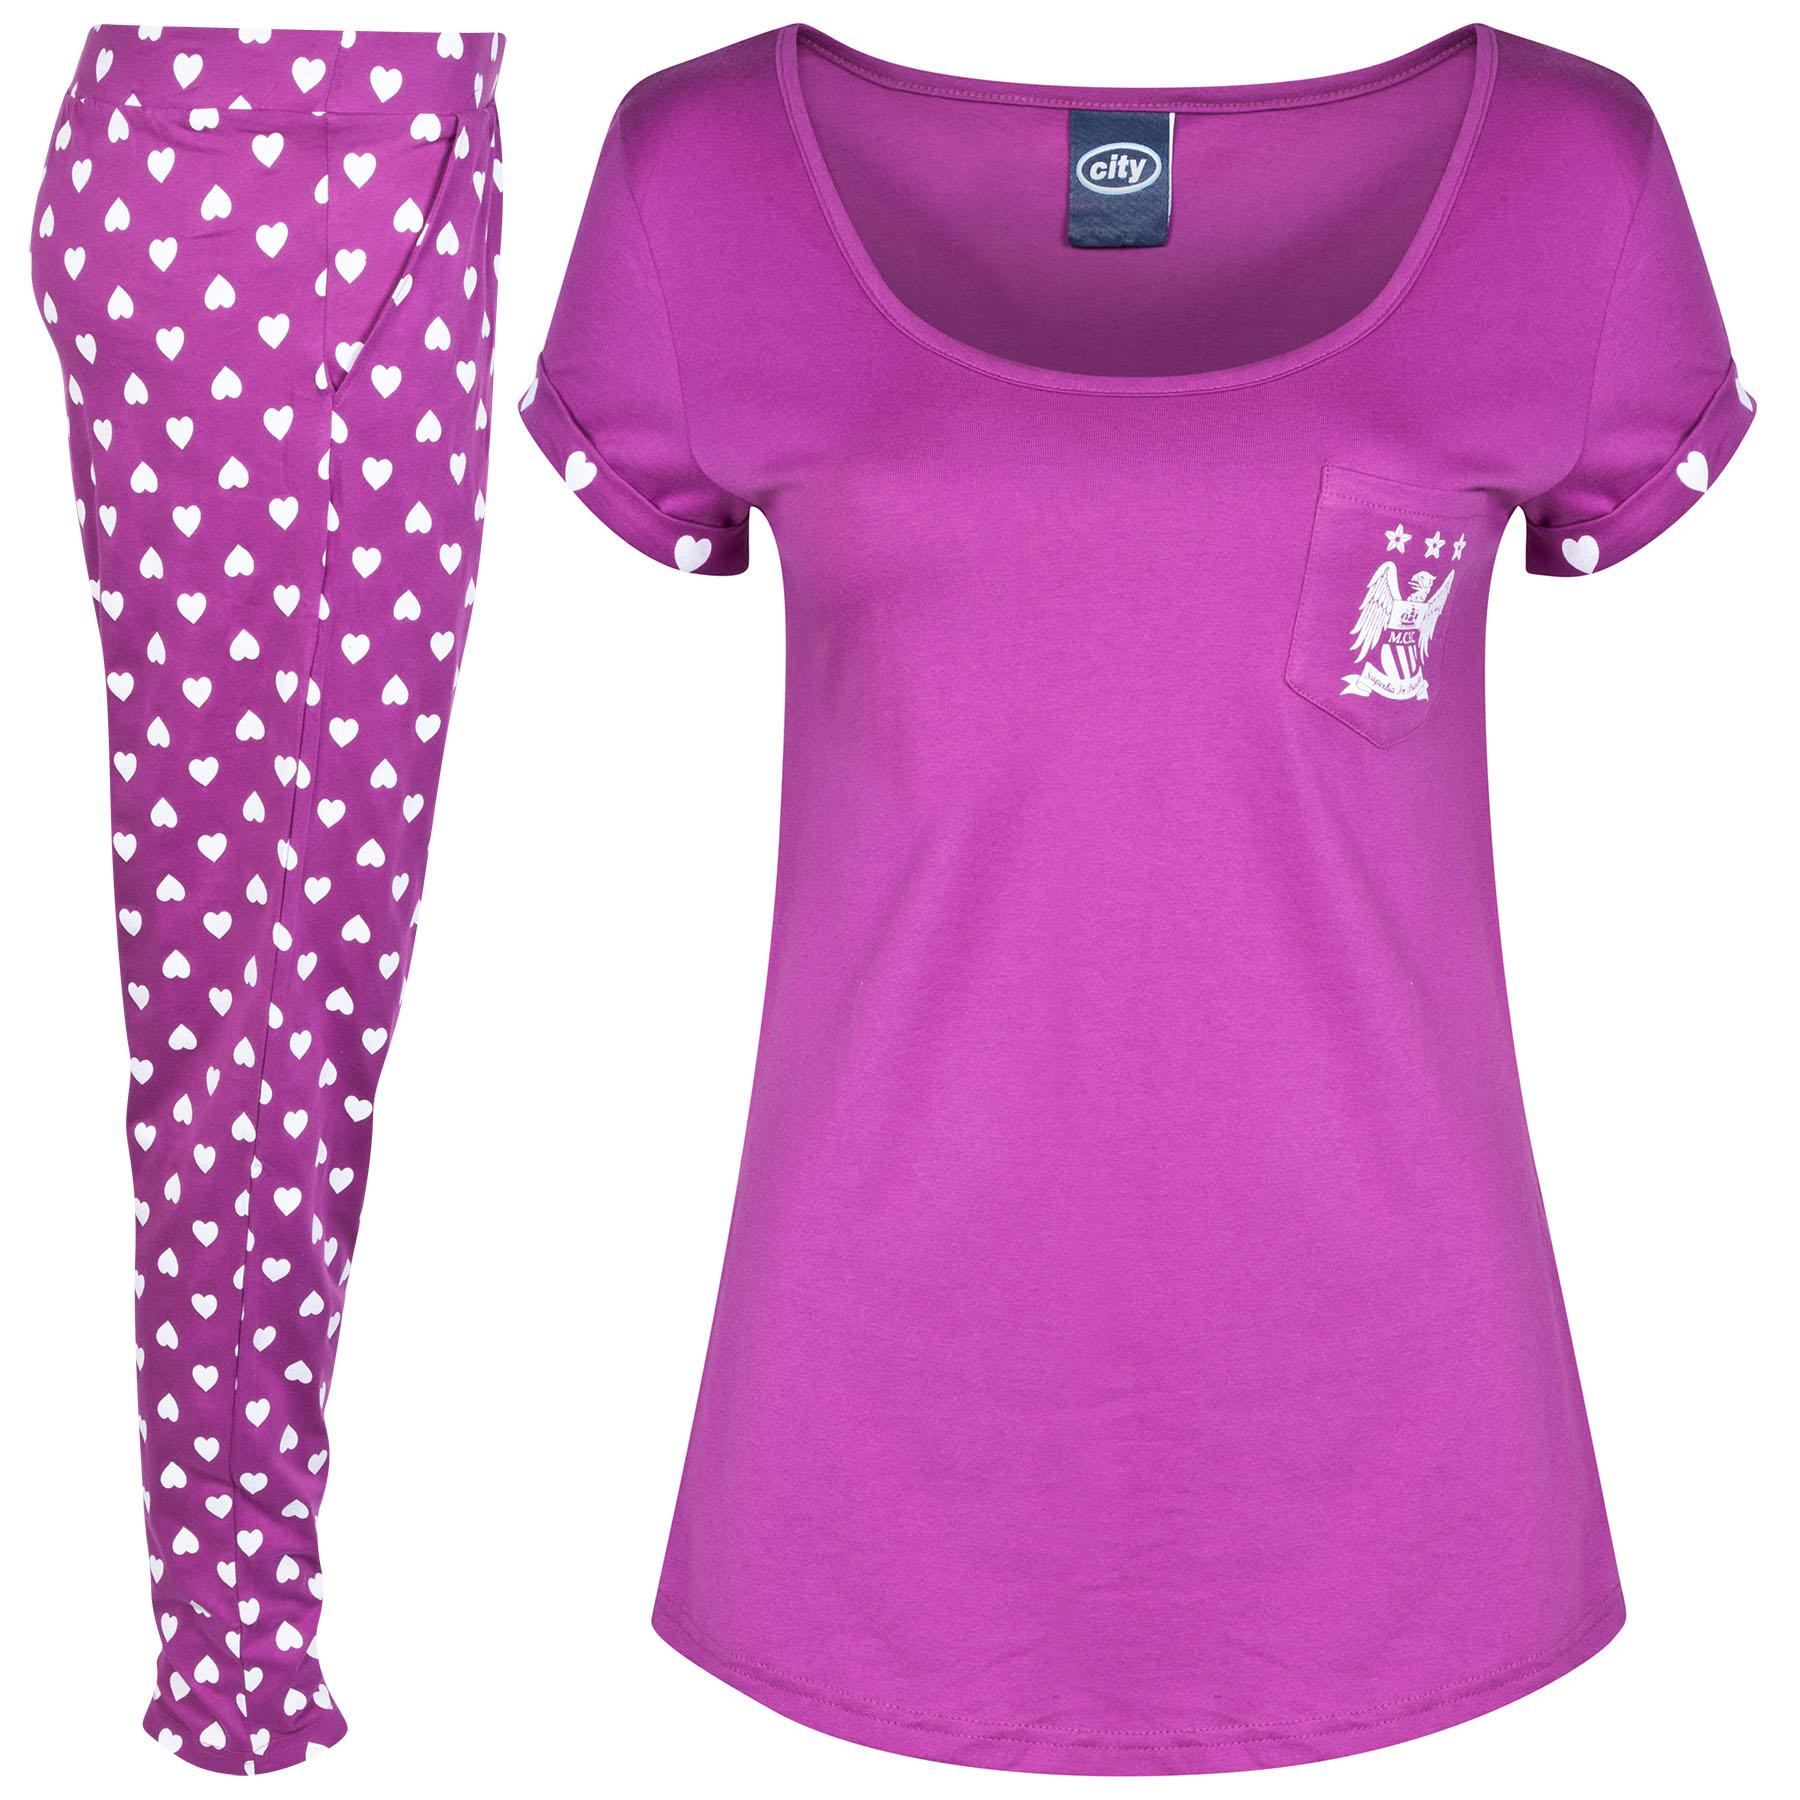 Manchester City Pyjamas - Magenta Pink - Womens